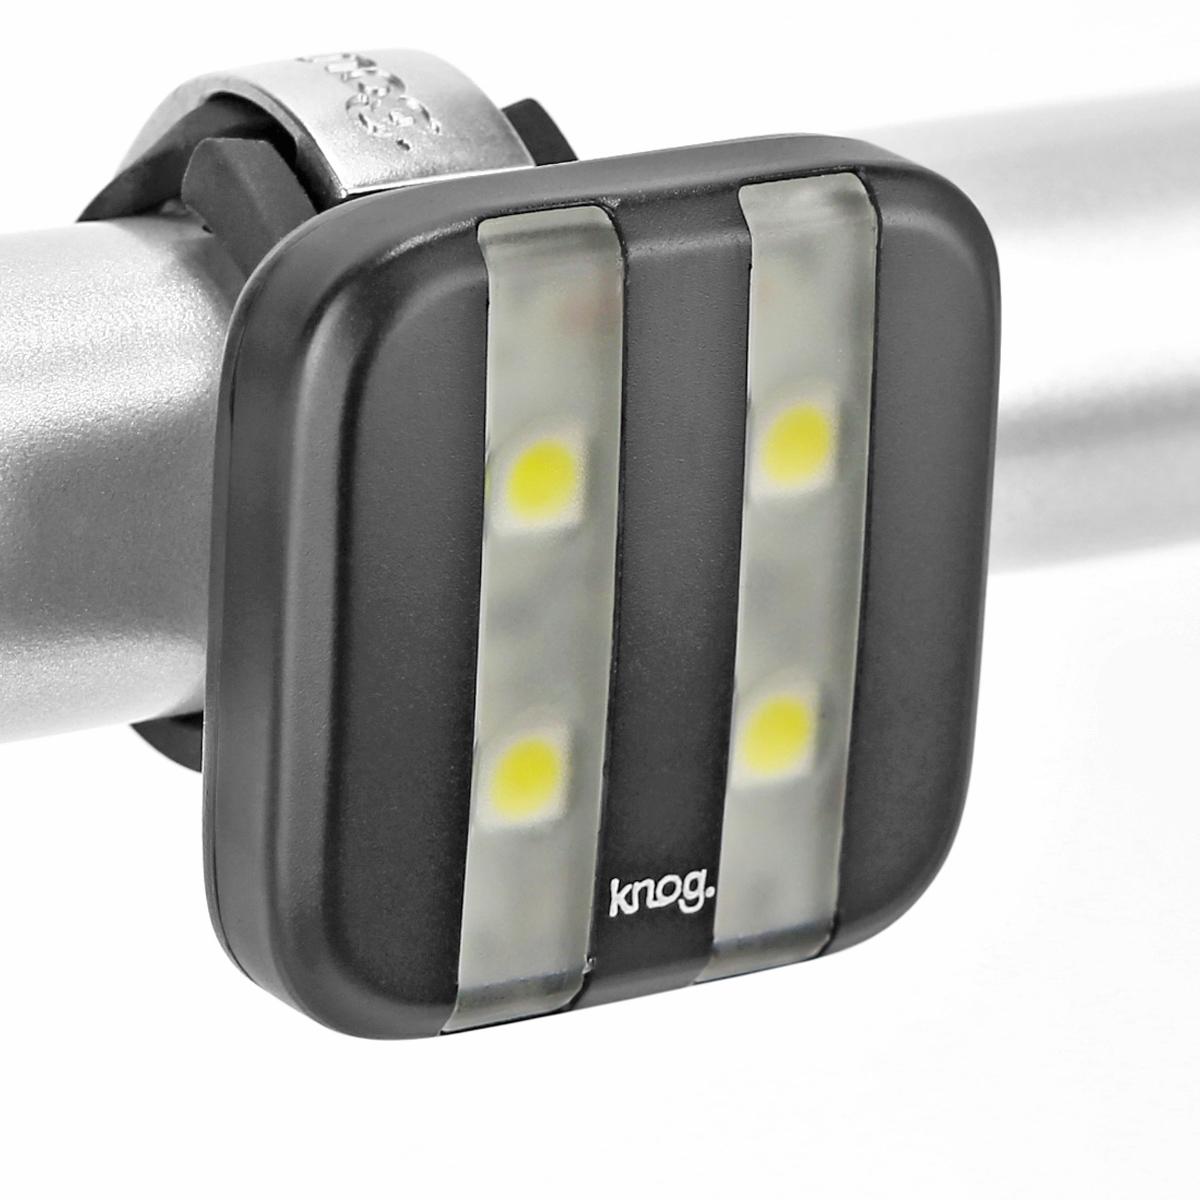 Éclairage avant Knog Blinder Ligne 4 LED - Noir